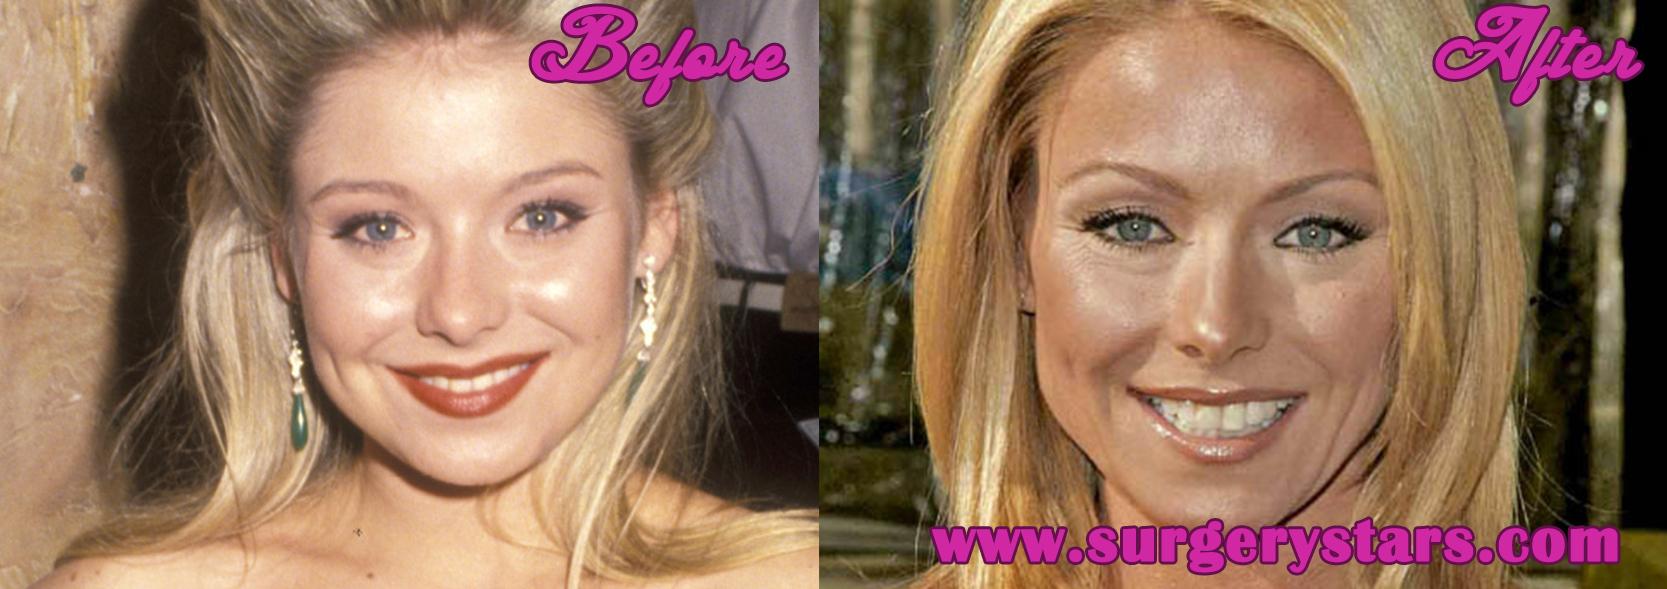 Kelly Ripa Plastic Surgery nose job and botox